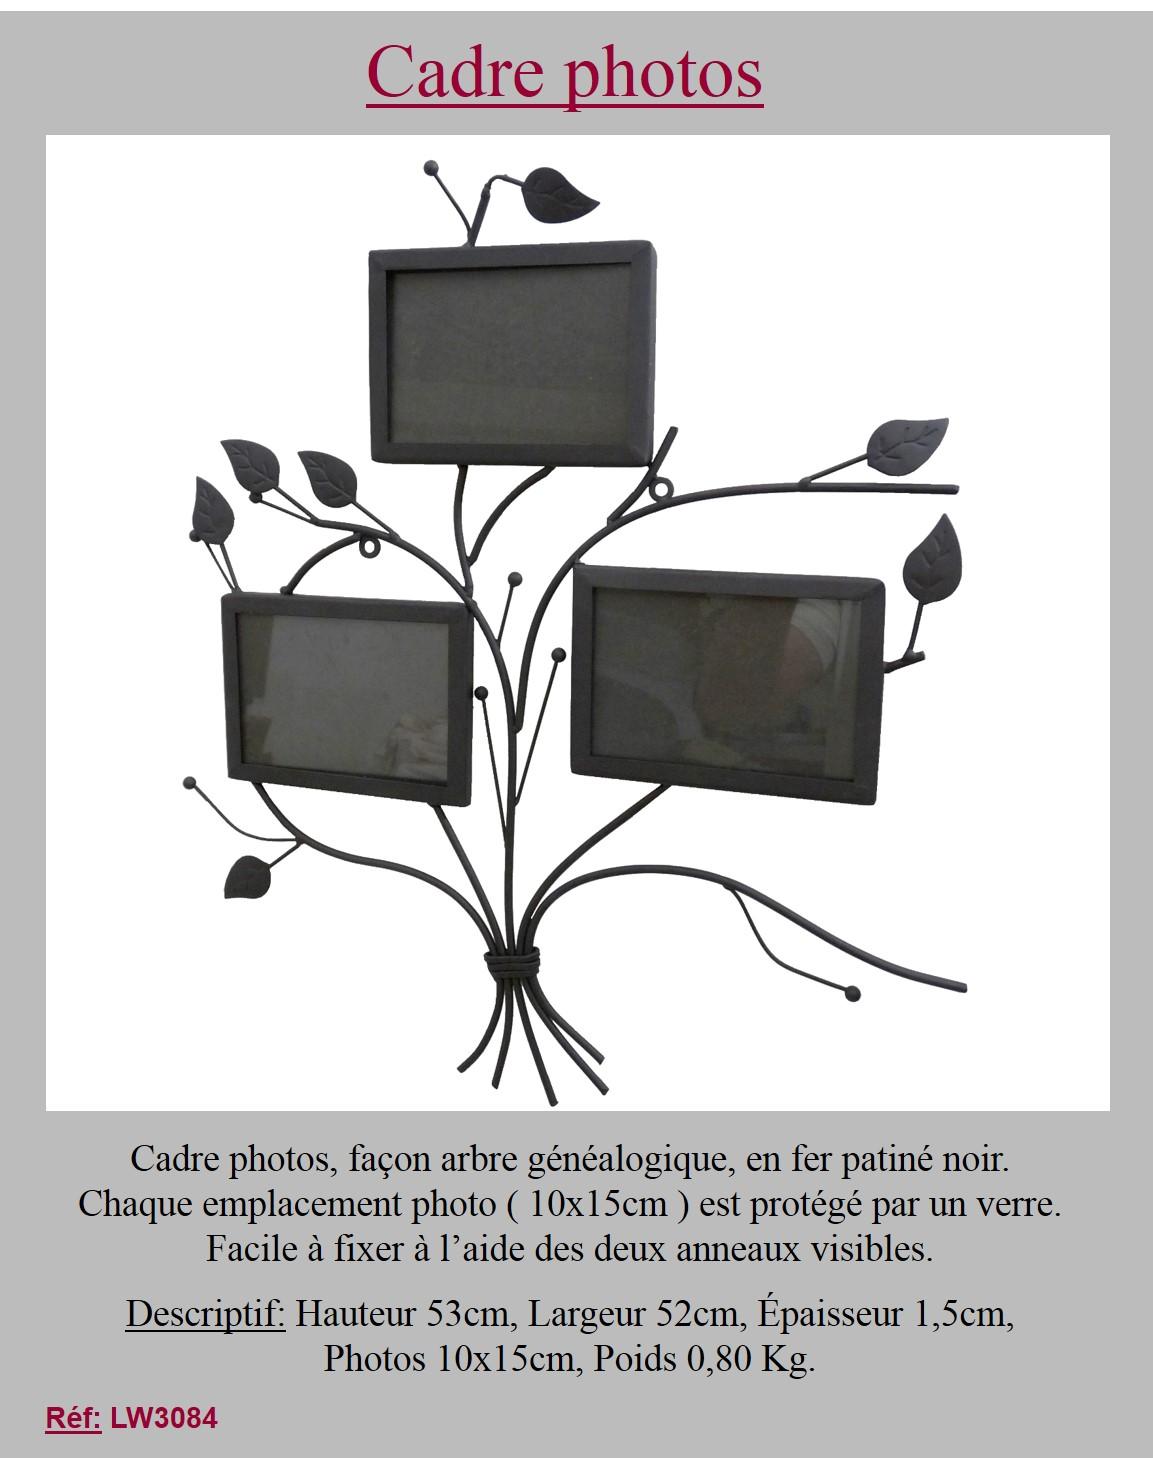 porte photos arbre de vie murale porte souvenirs 3 cadres rectangulaire 53x52cm ebay. Black Bedroom Furniture Sets. Home Design Ideas